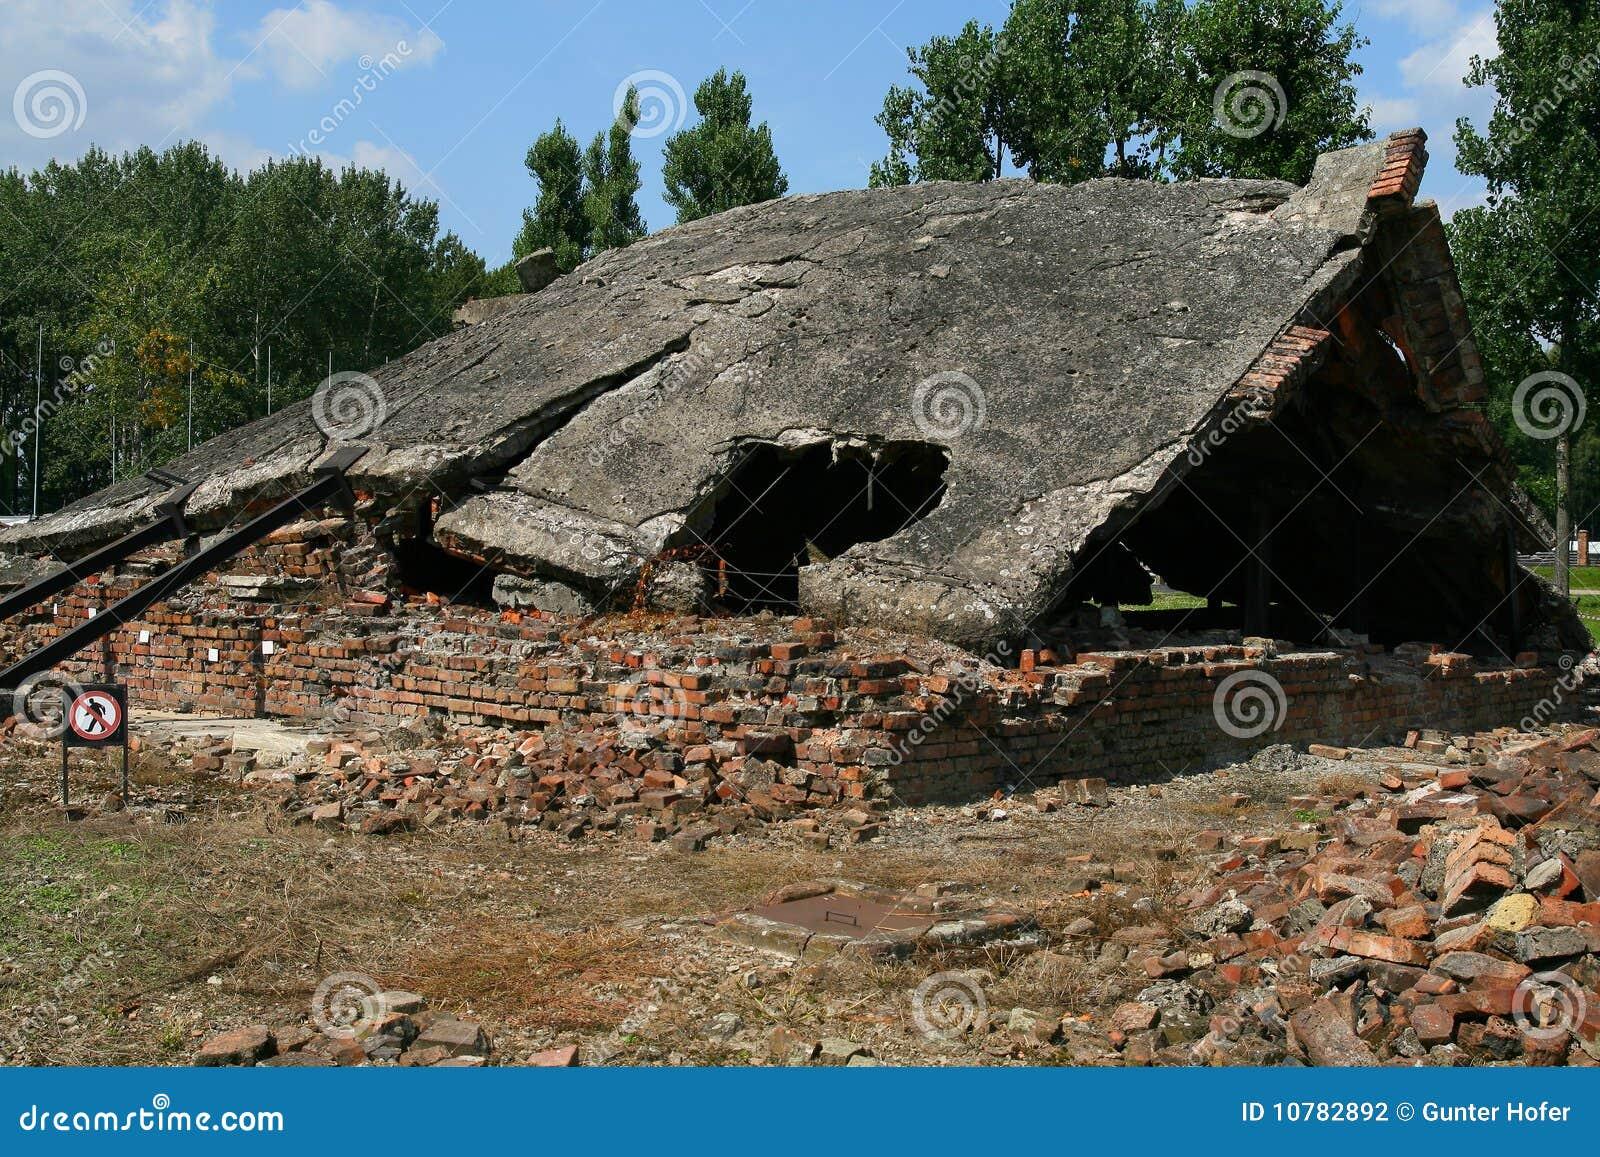 Chambres gaz d 39 auschwitz photographie ditorial image - Existence des chambres a gaz ...